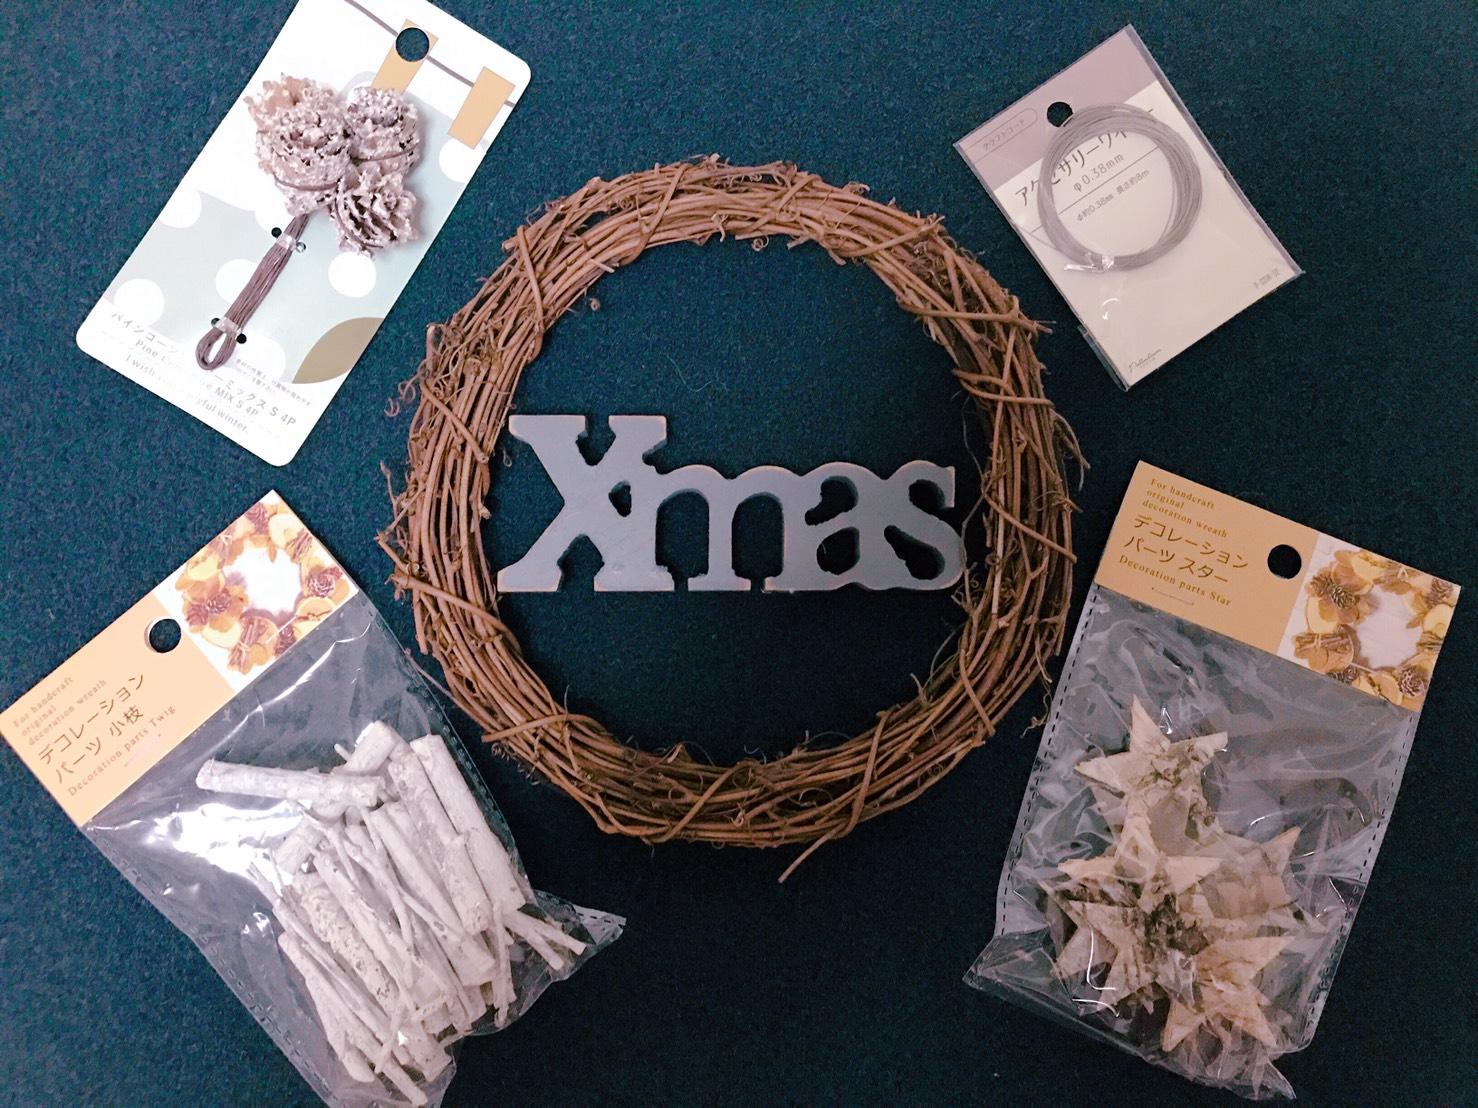 【#Seria】可愛すぎるセリアの新作itemでクリスマスムードを楽しむ♡_2